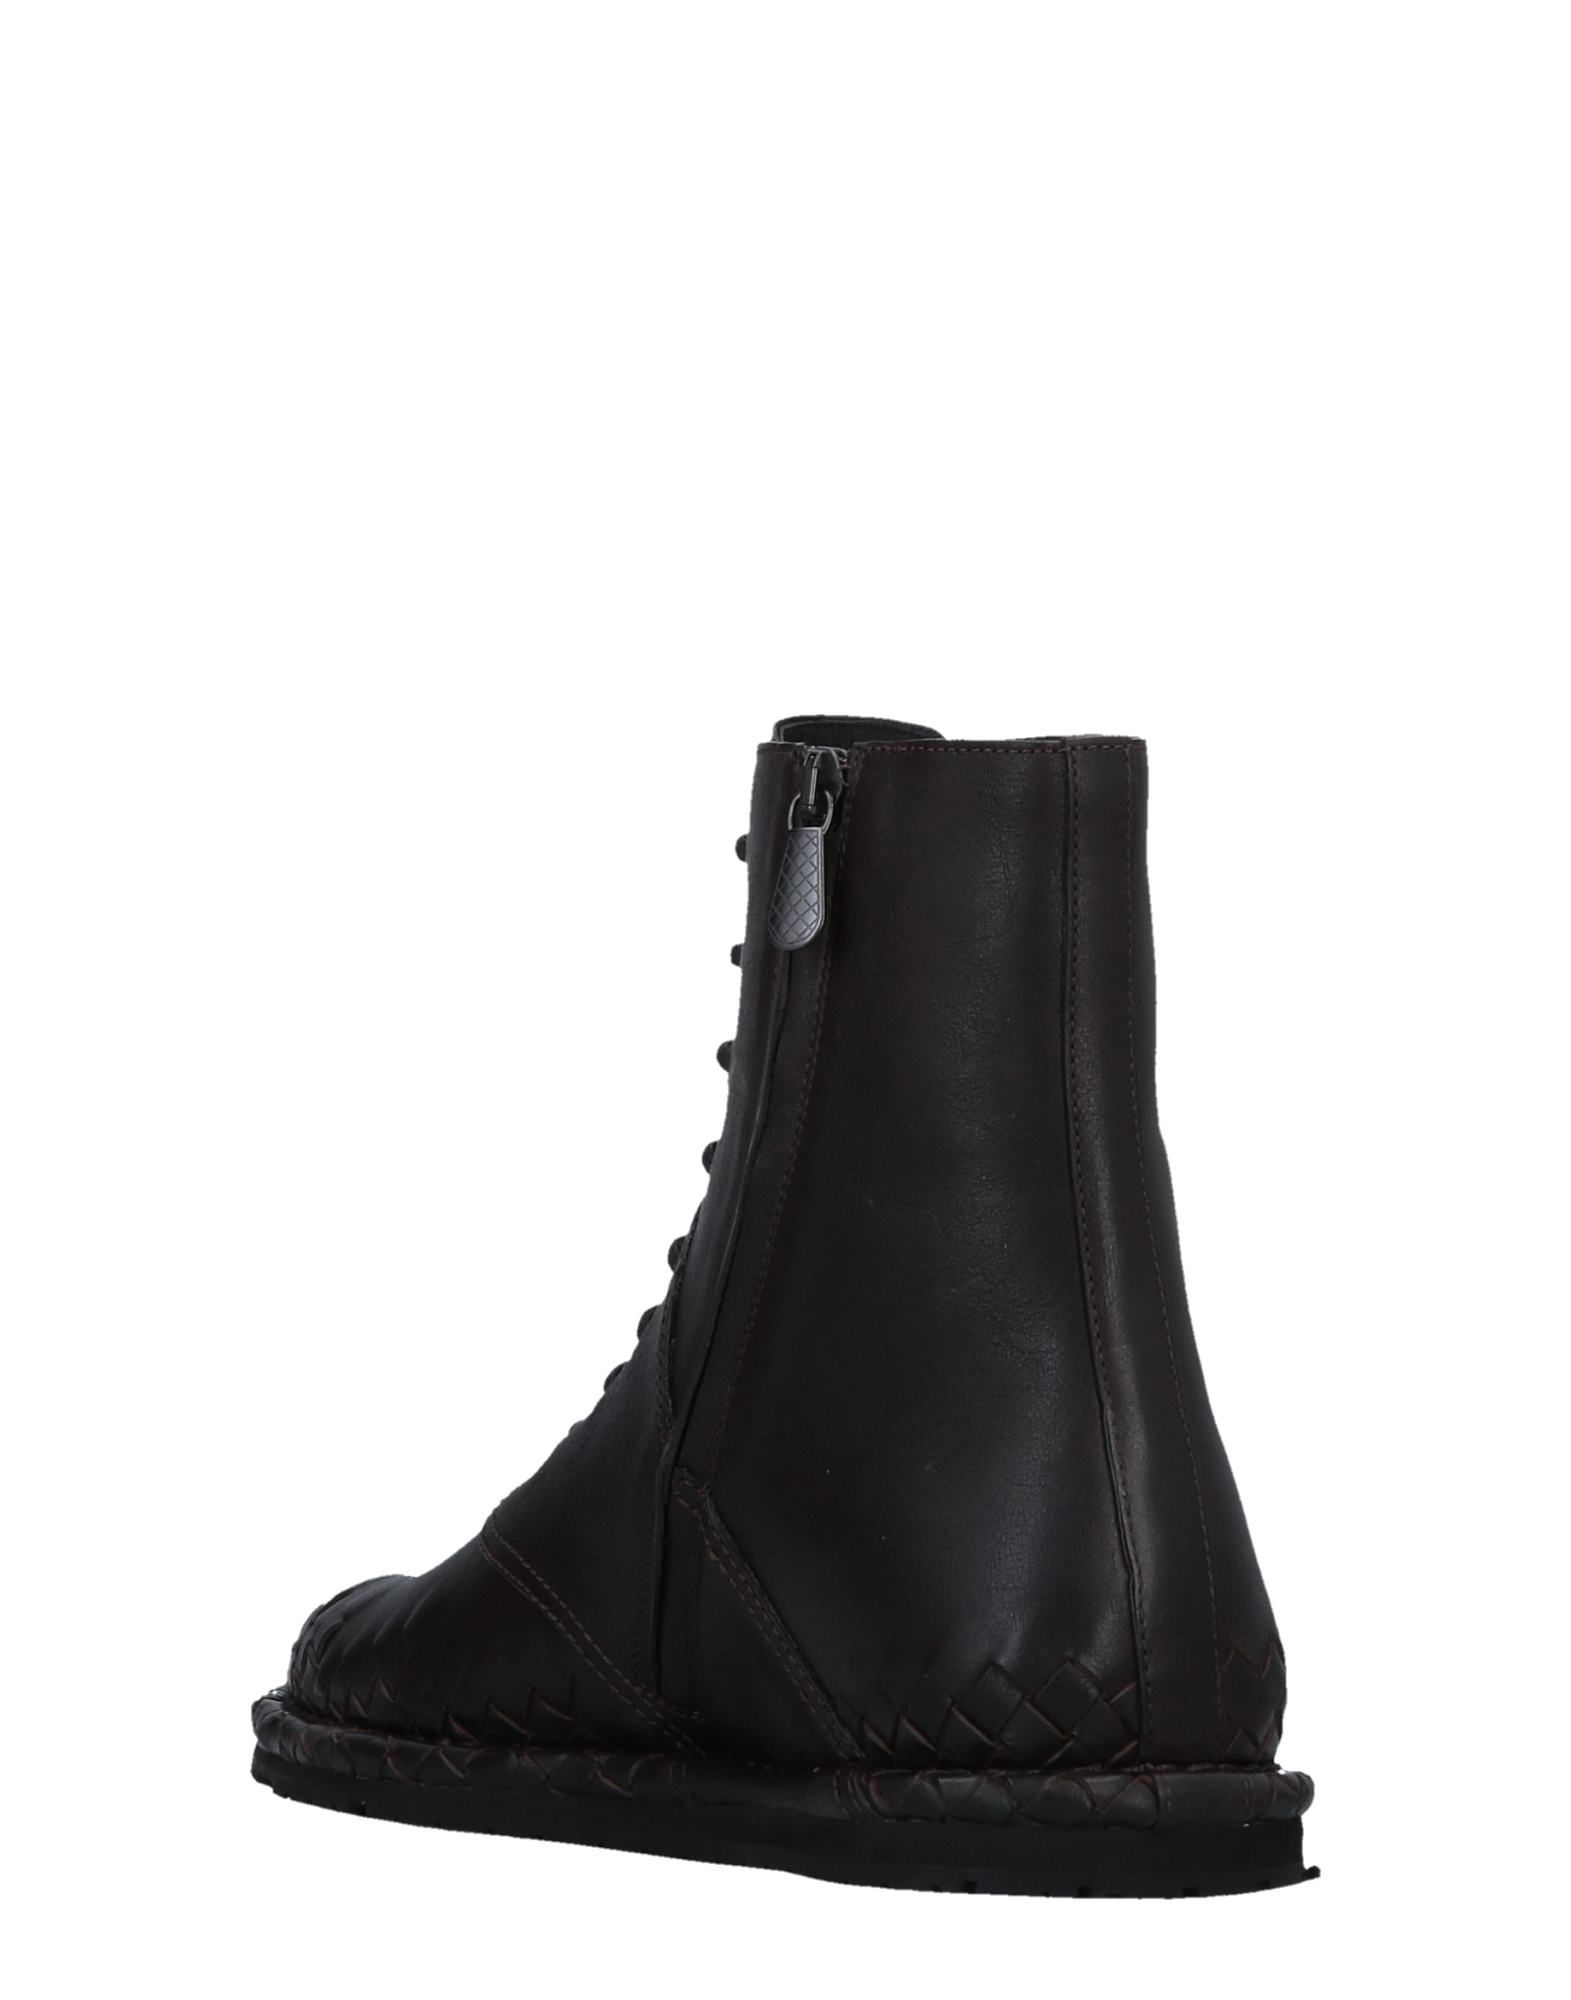 Bottega Veneta Stiefelette Herren Herren Stiefelette  11433167IK Gute Qualität beliebte Schuhe 15d018